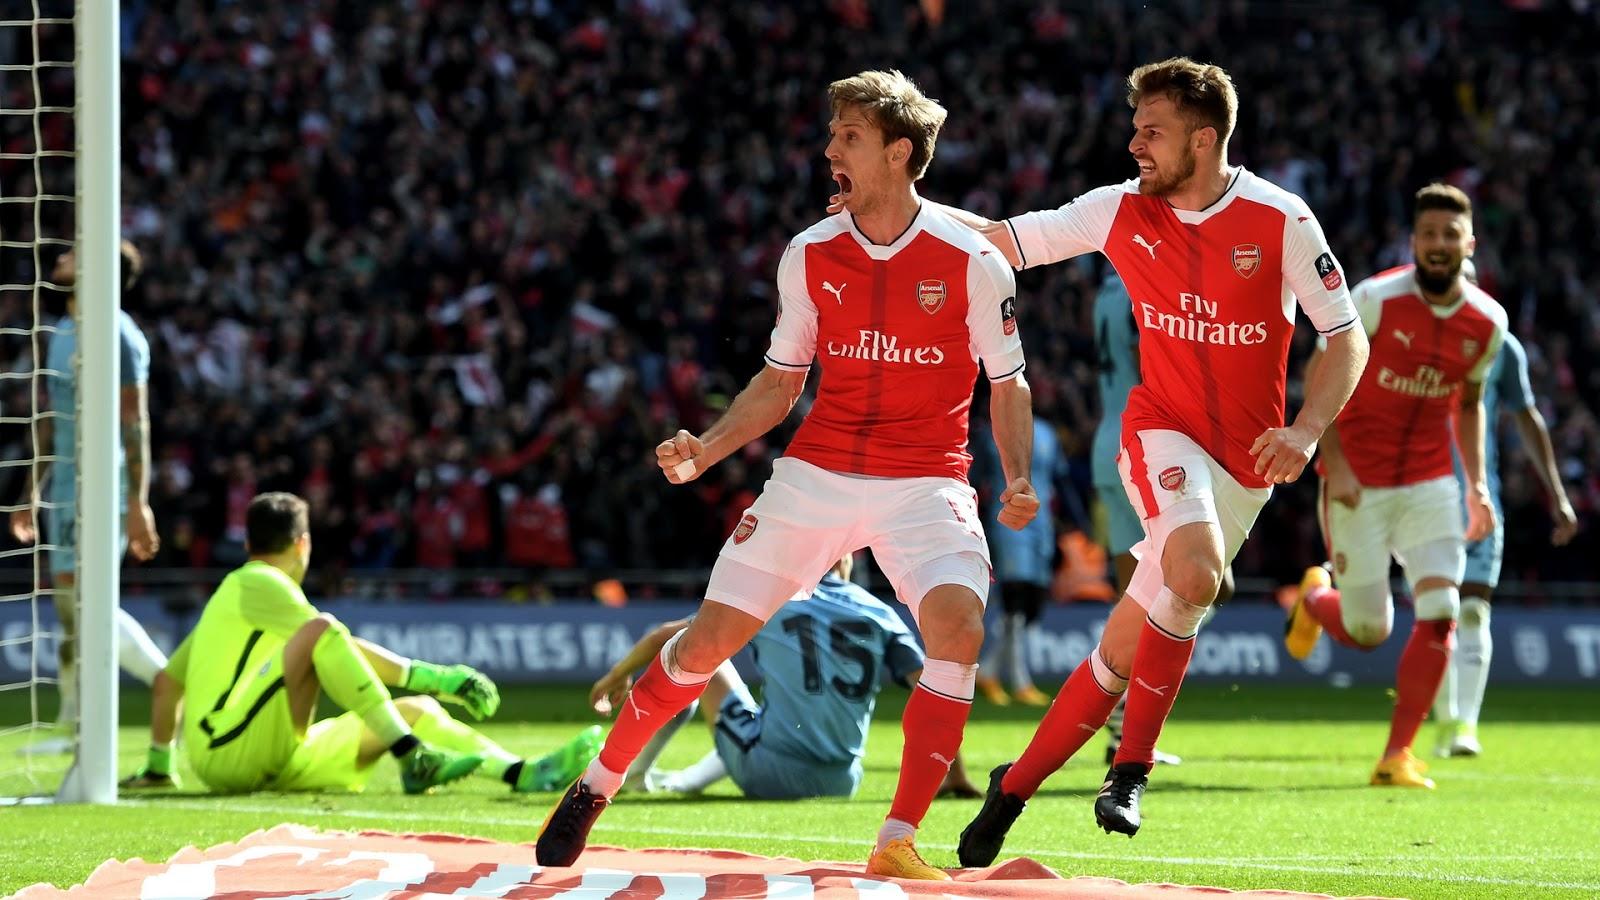 Arsenal Melangkahkan Kaki Ke Final Dan Akan Bertemu The Blues